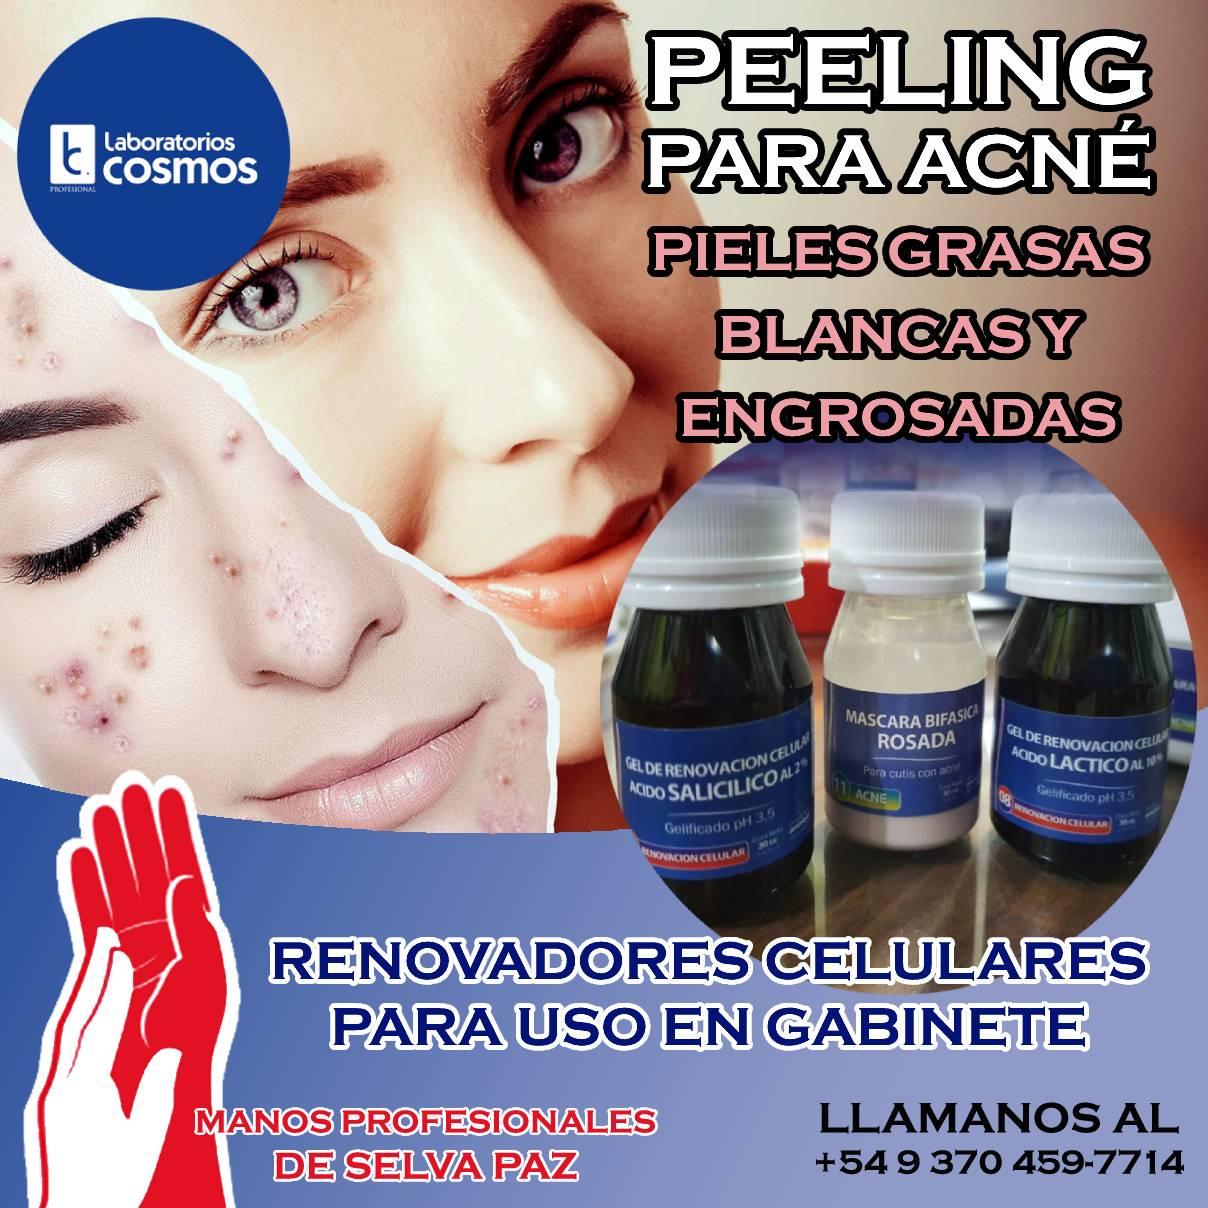 Peeling para Acné. Renovadores Celulares para pieles grasas, blancas y engrosadas.